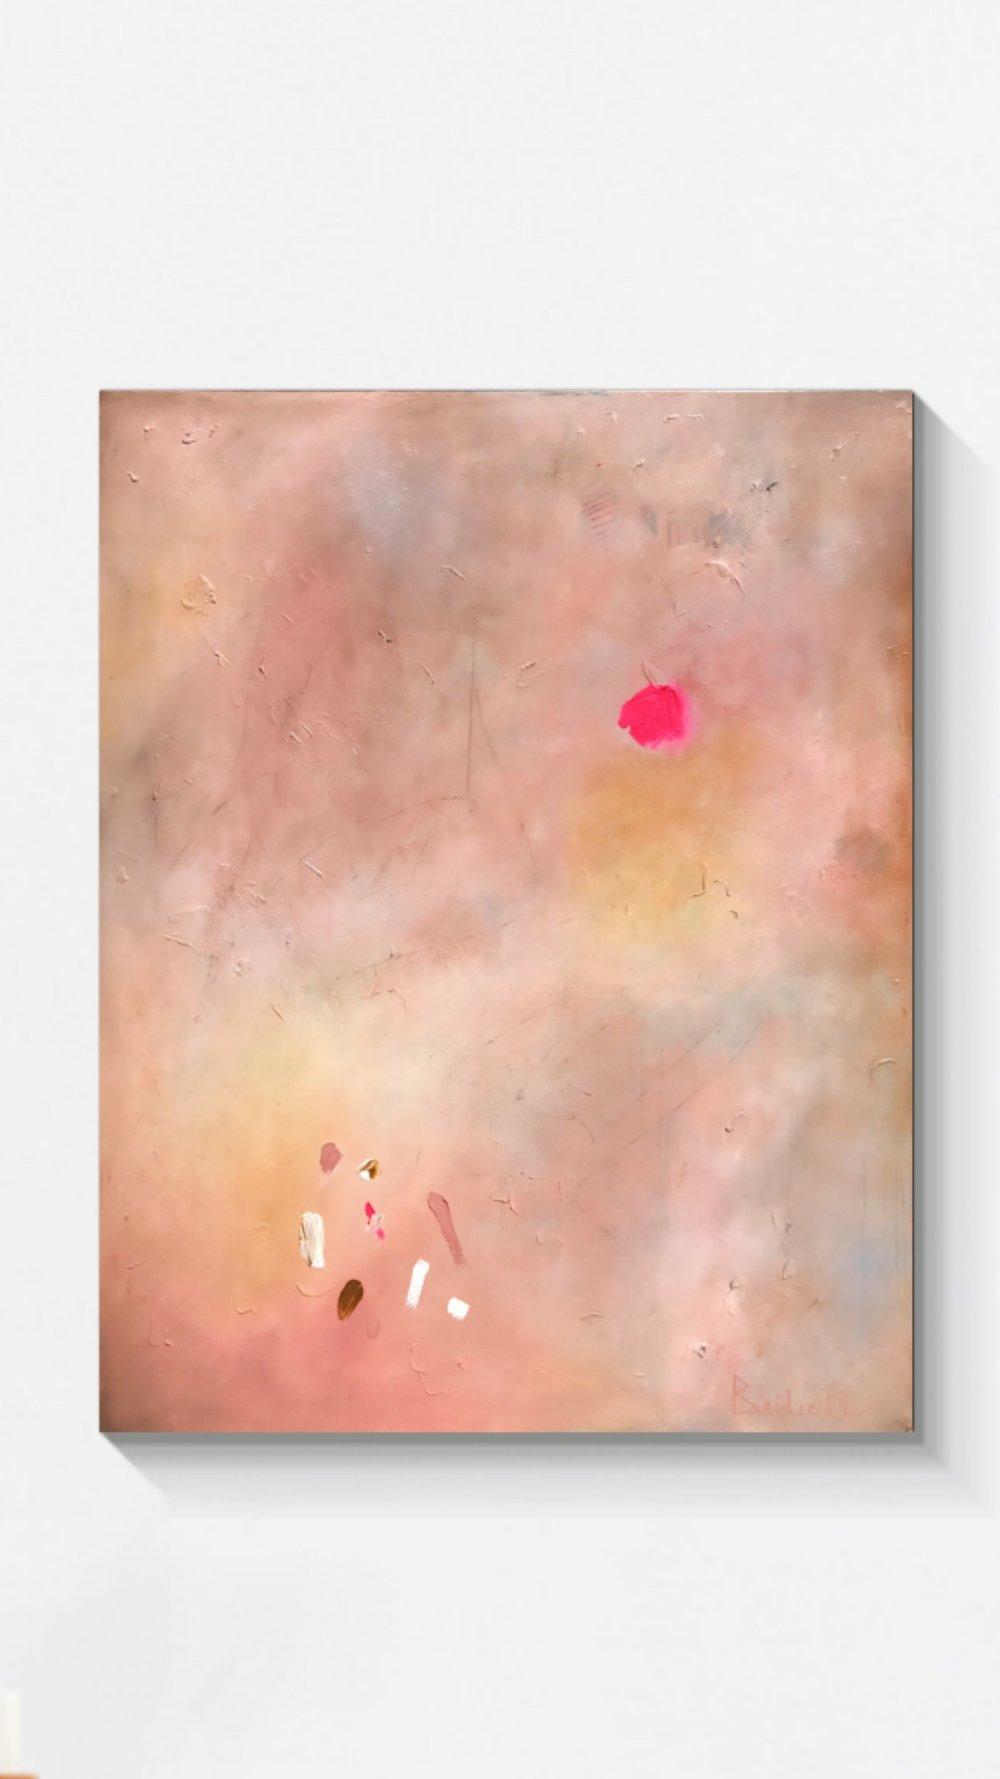 Millennial Pink II   60x48 - Oil on Canvas